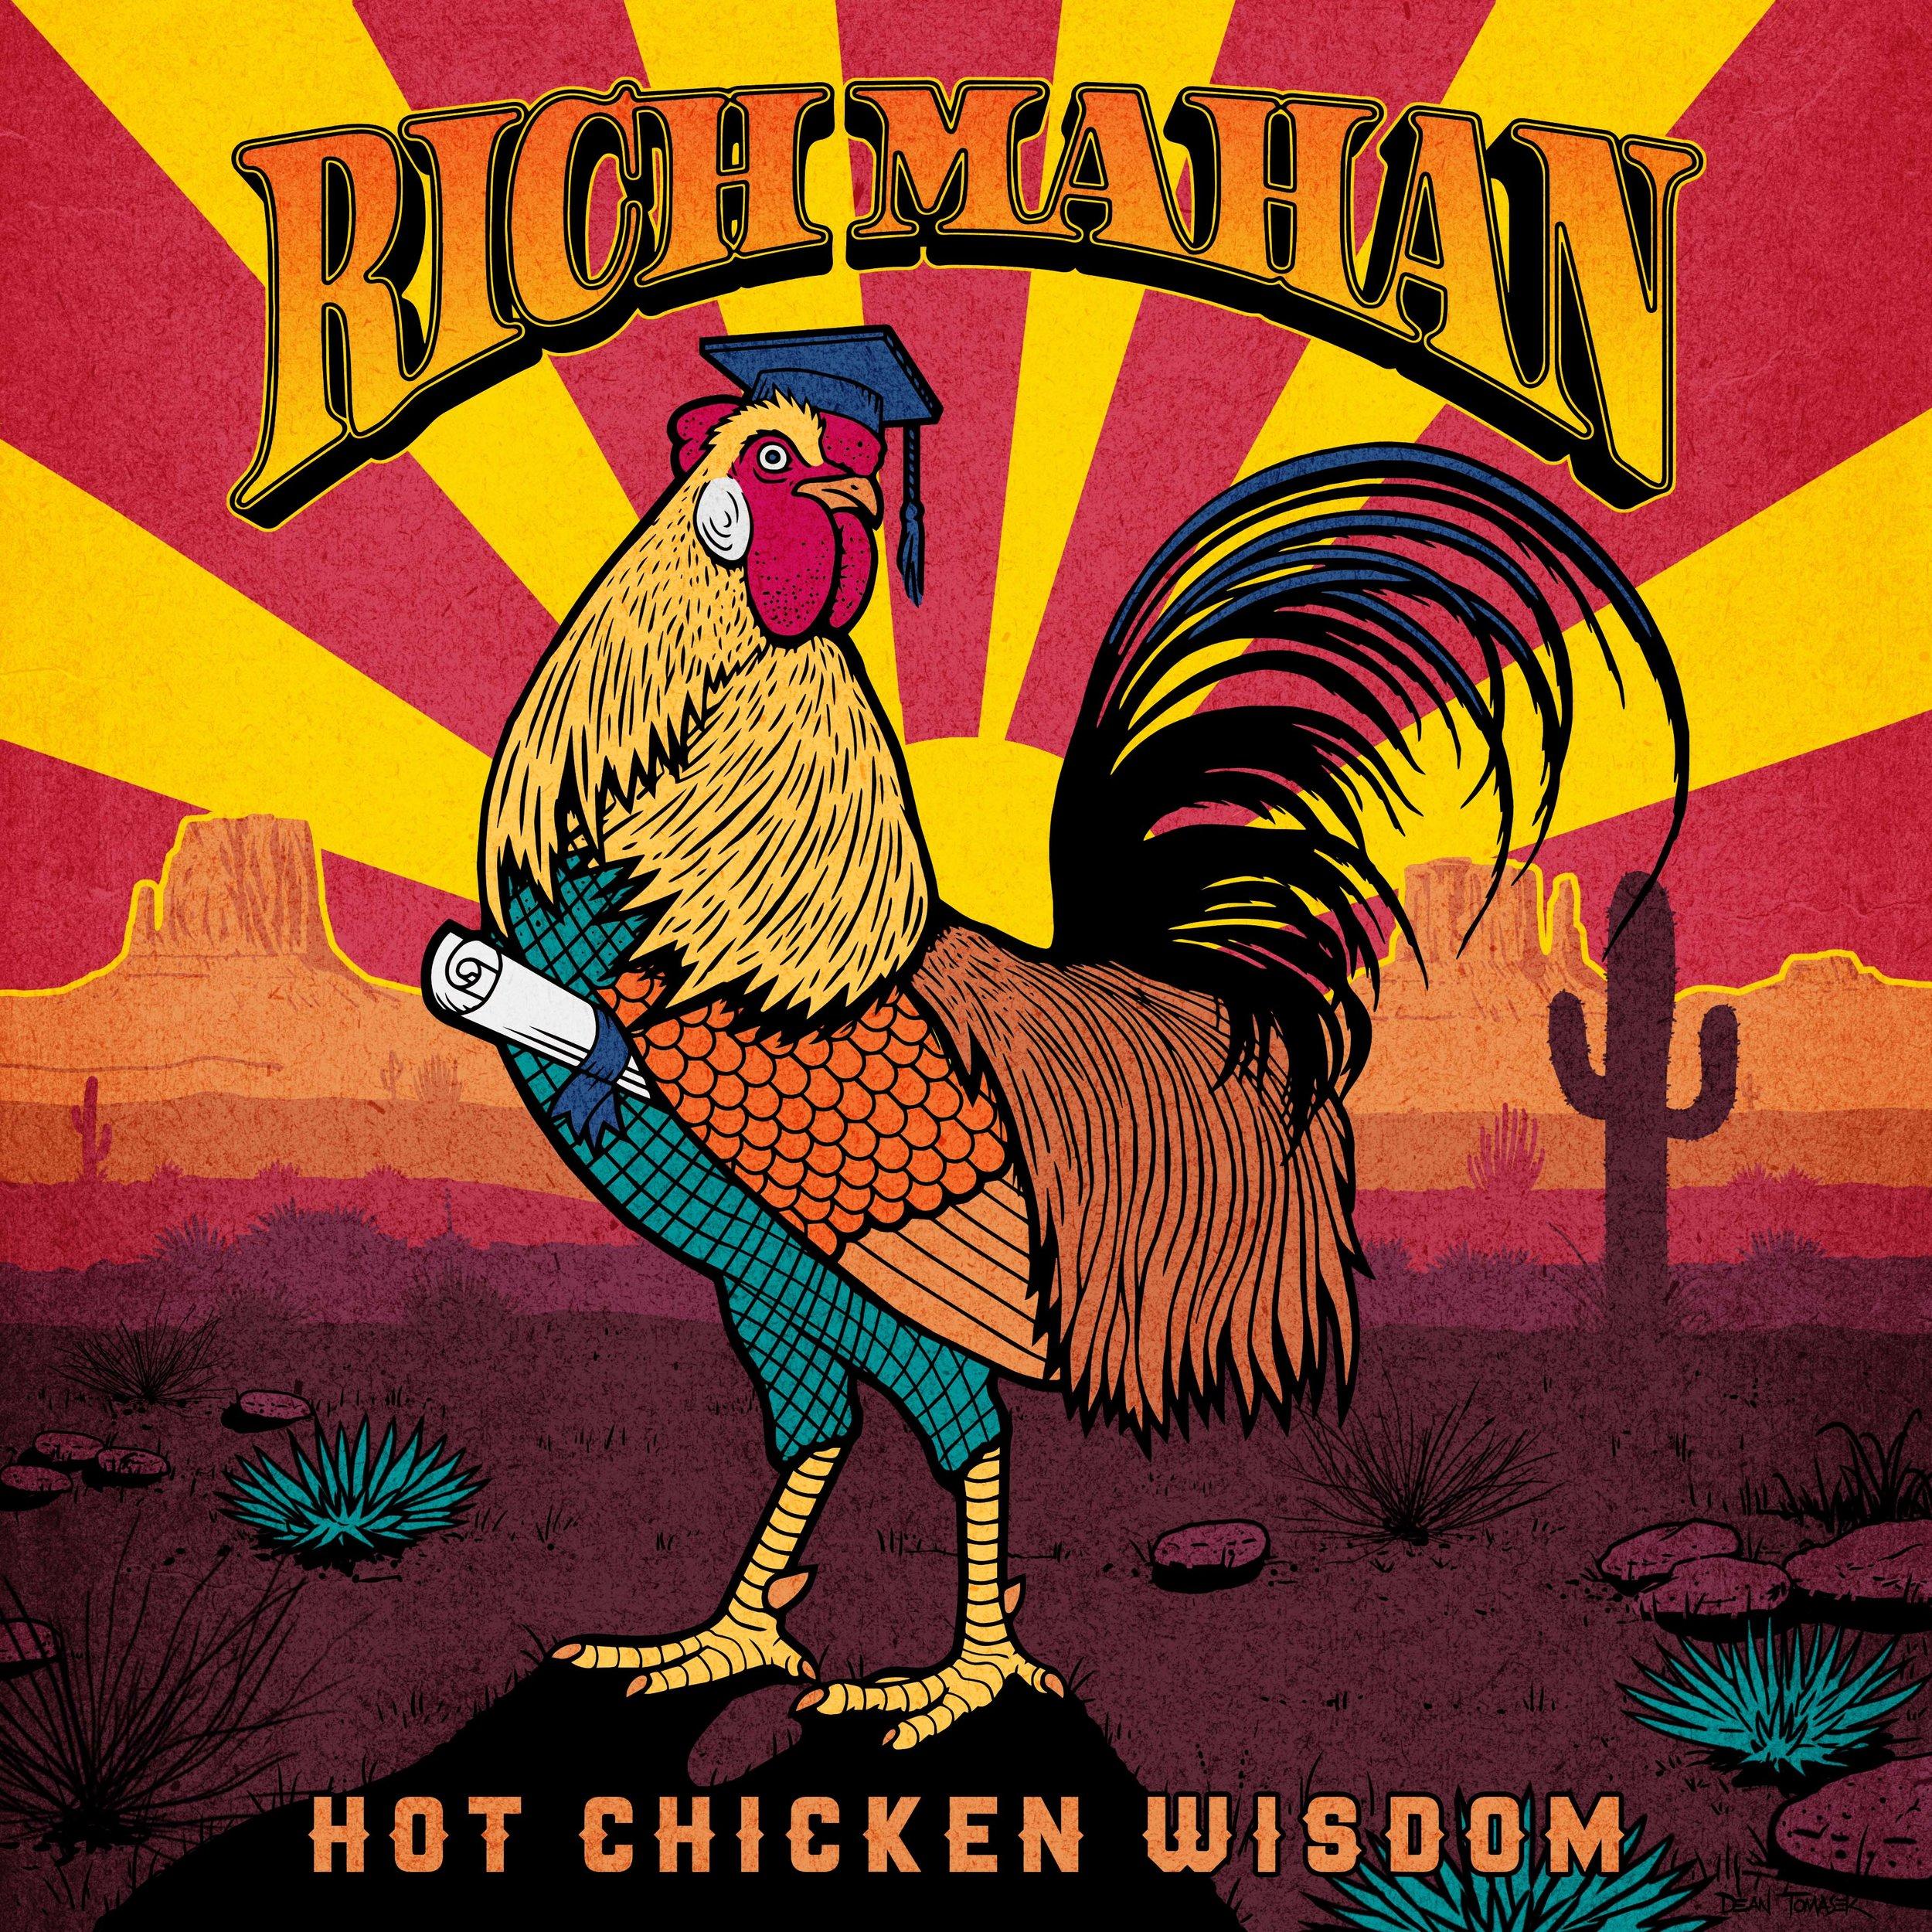 Rich Mahan - Hot Chicken Wisdom Cover.jpg